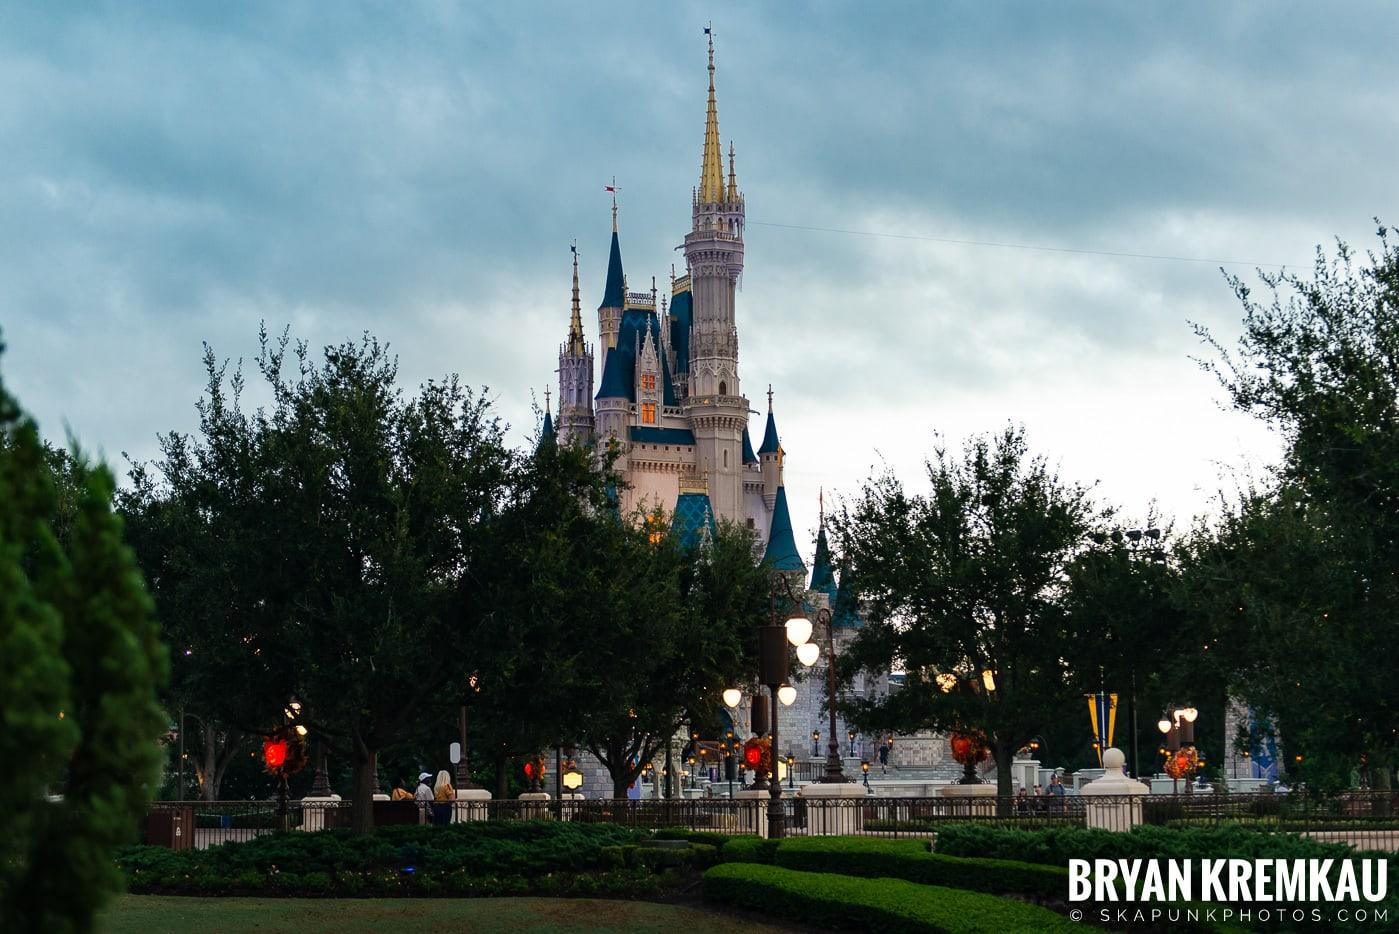 Walt Disney World Vacation: Day 6 (Magic Kingdom, Epcot, Disney's Hollywood Studios) - 10.4.19 (43)